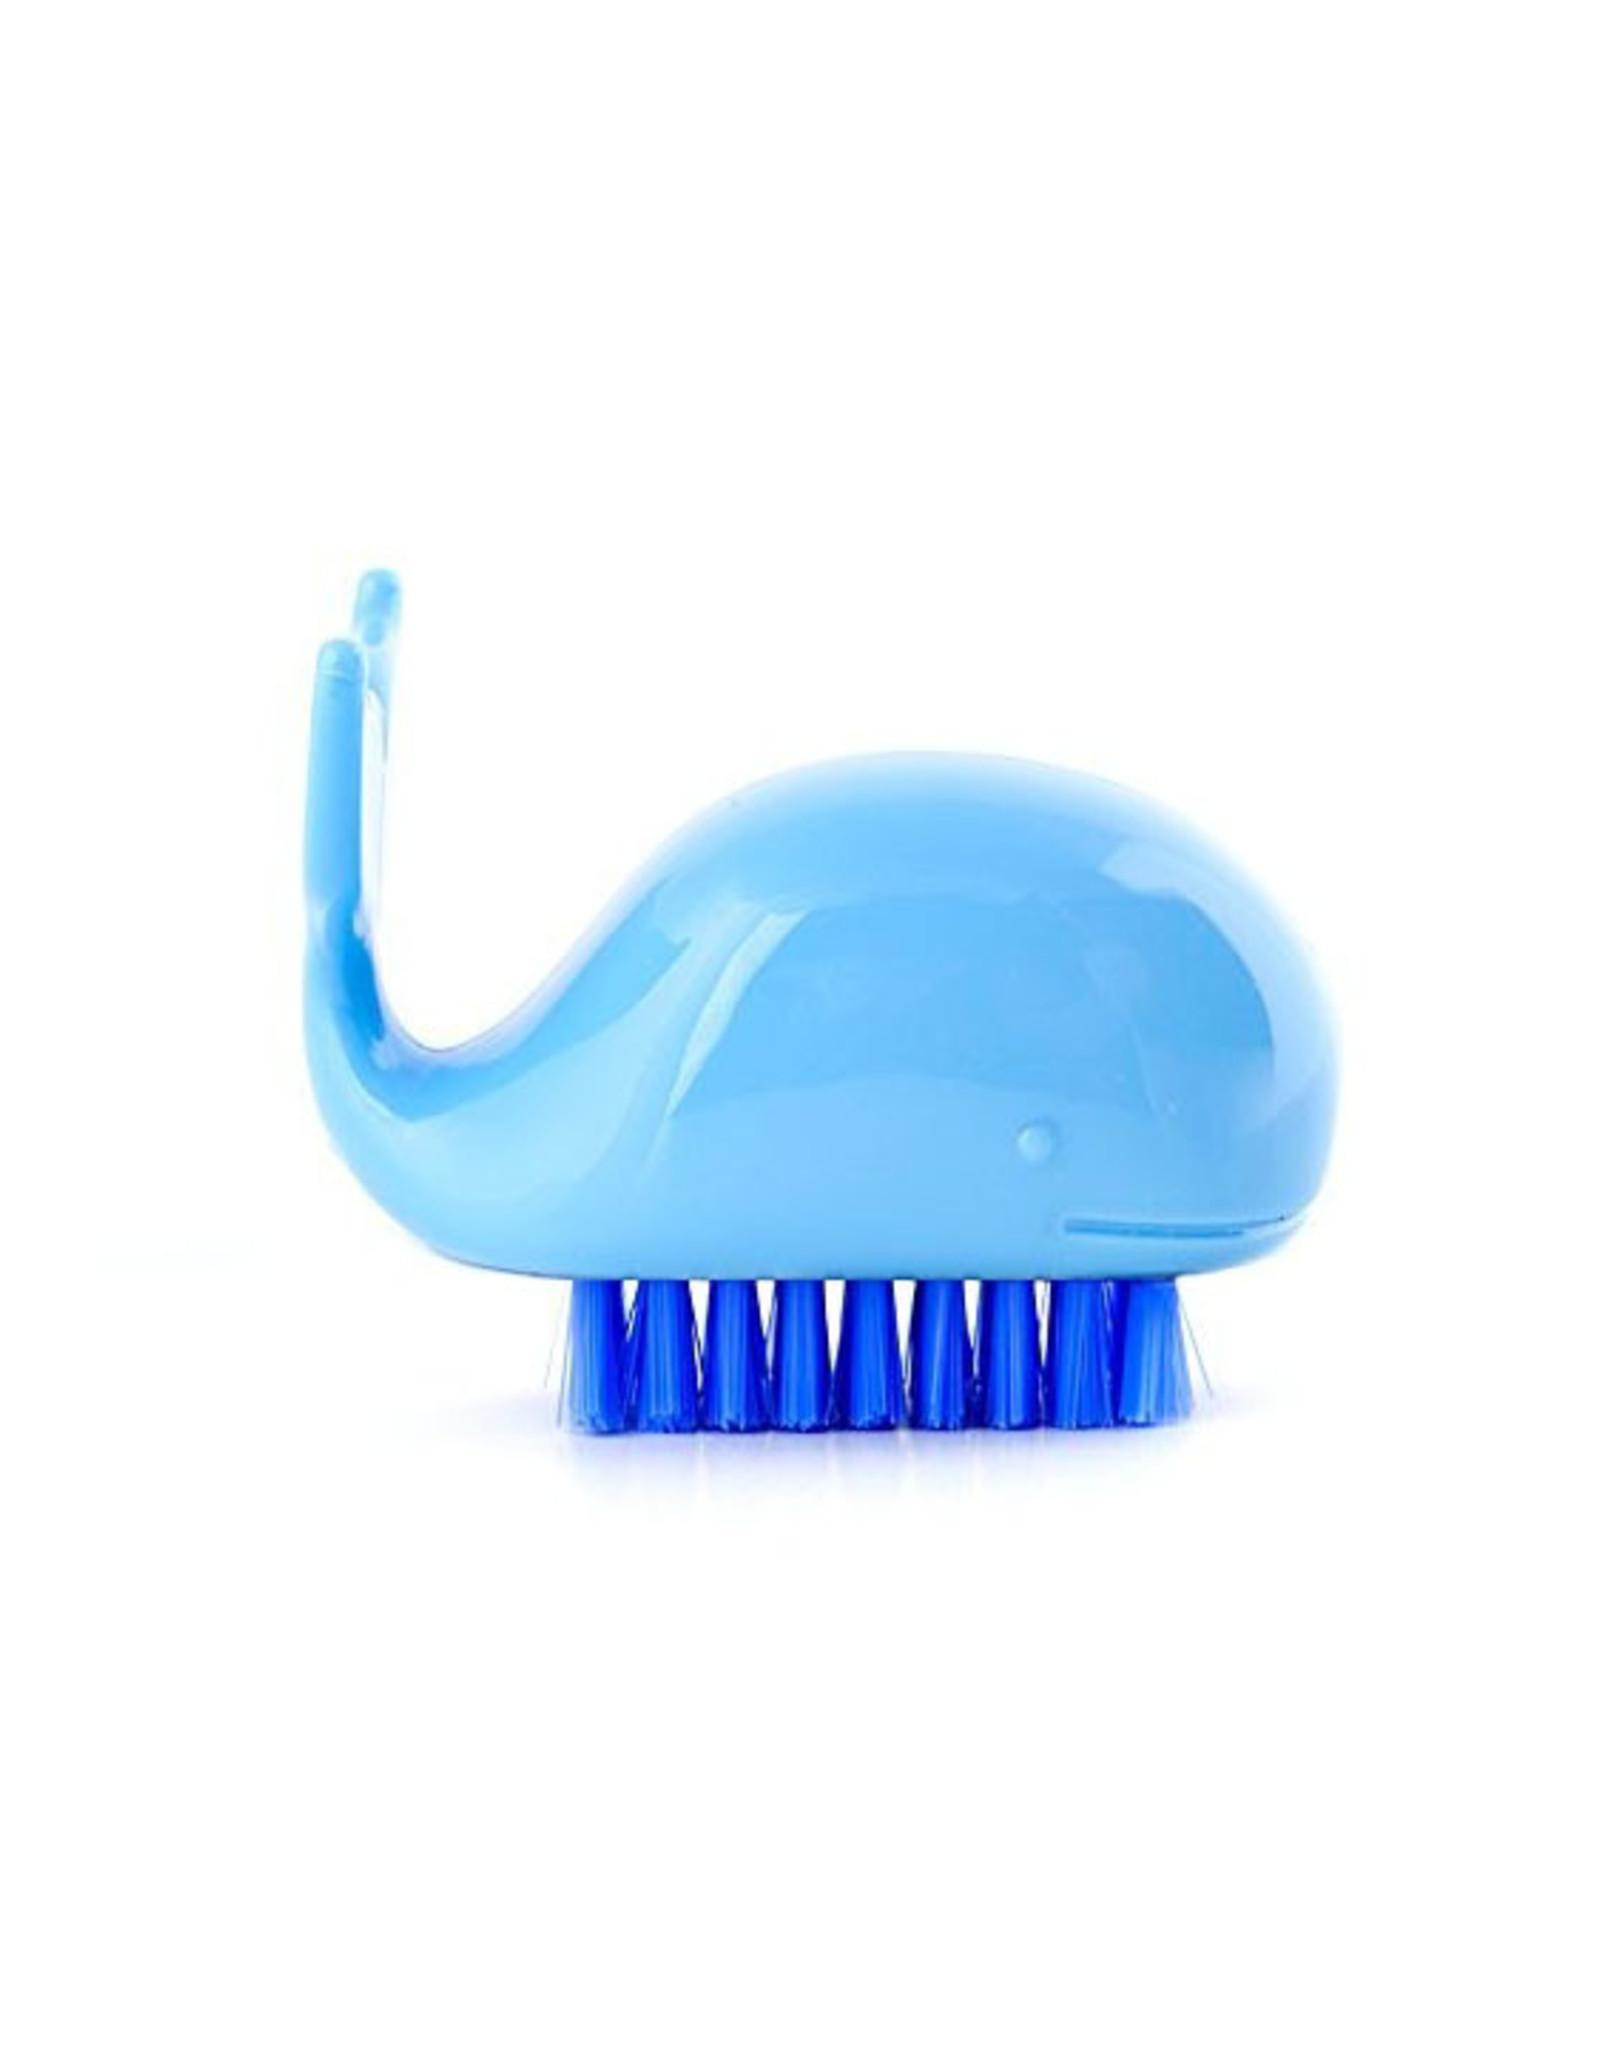 Whale Nail Brush